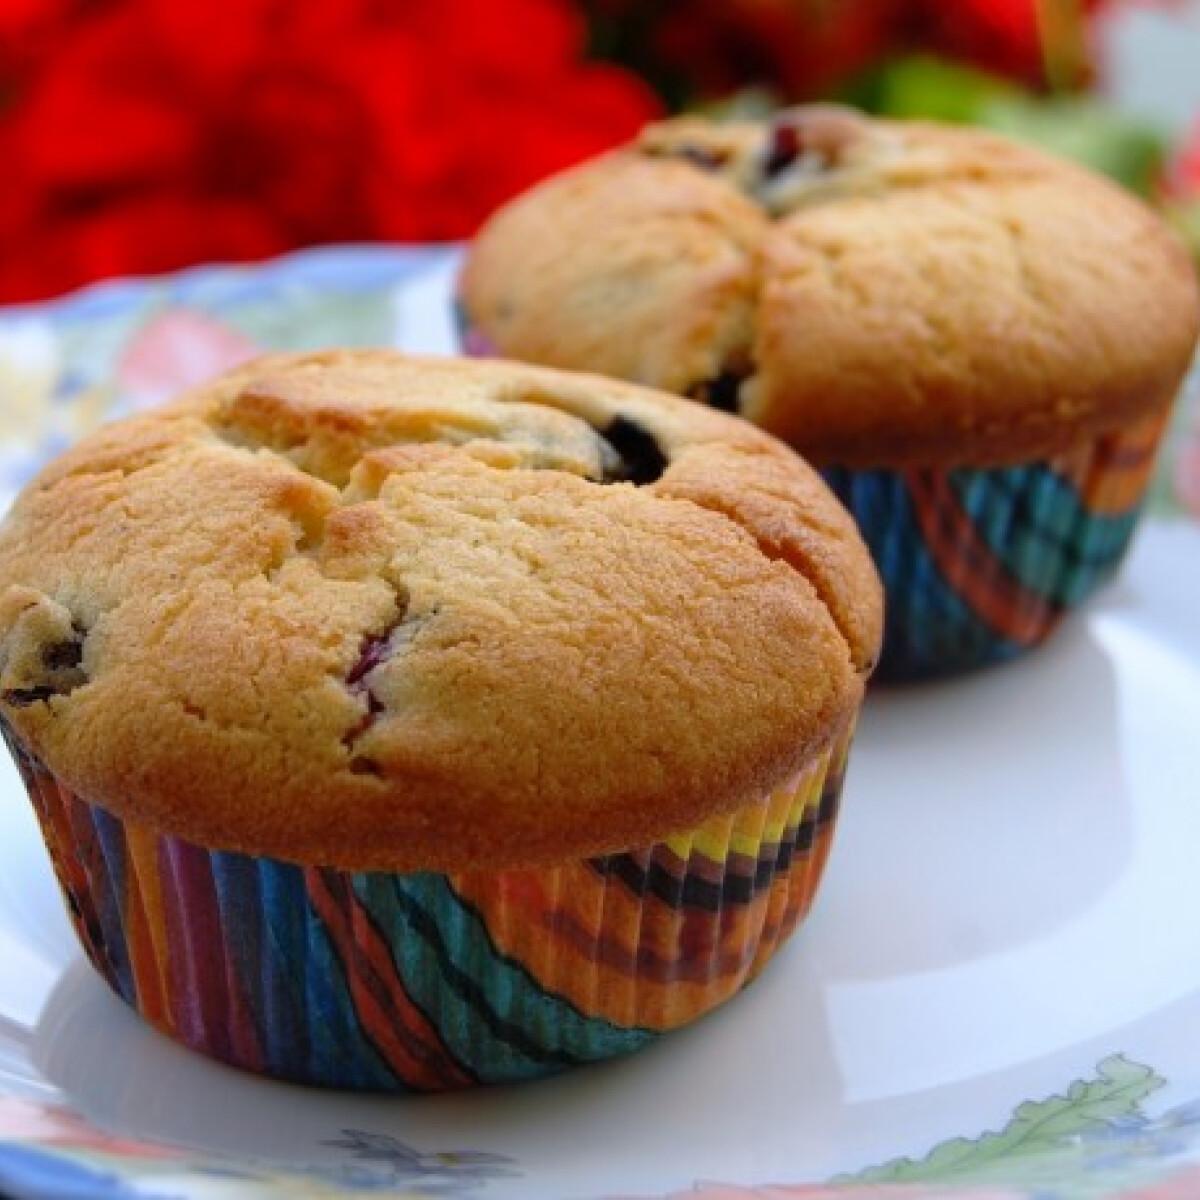 Áfonyás-írós muffin